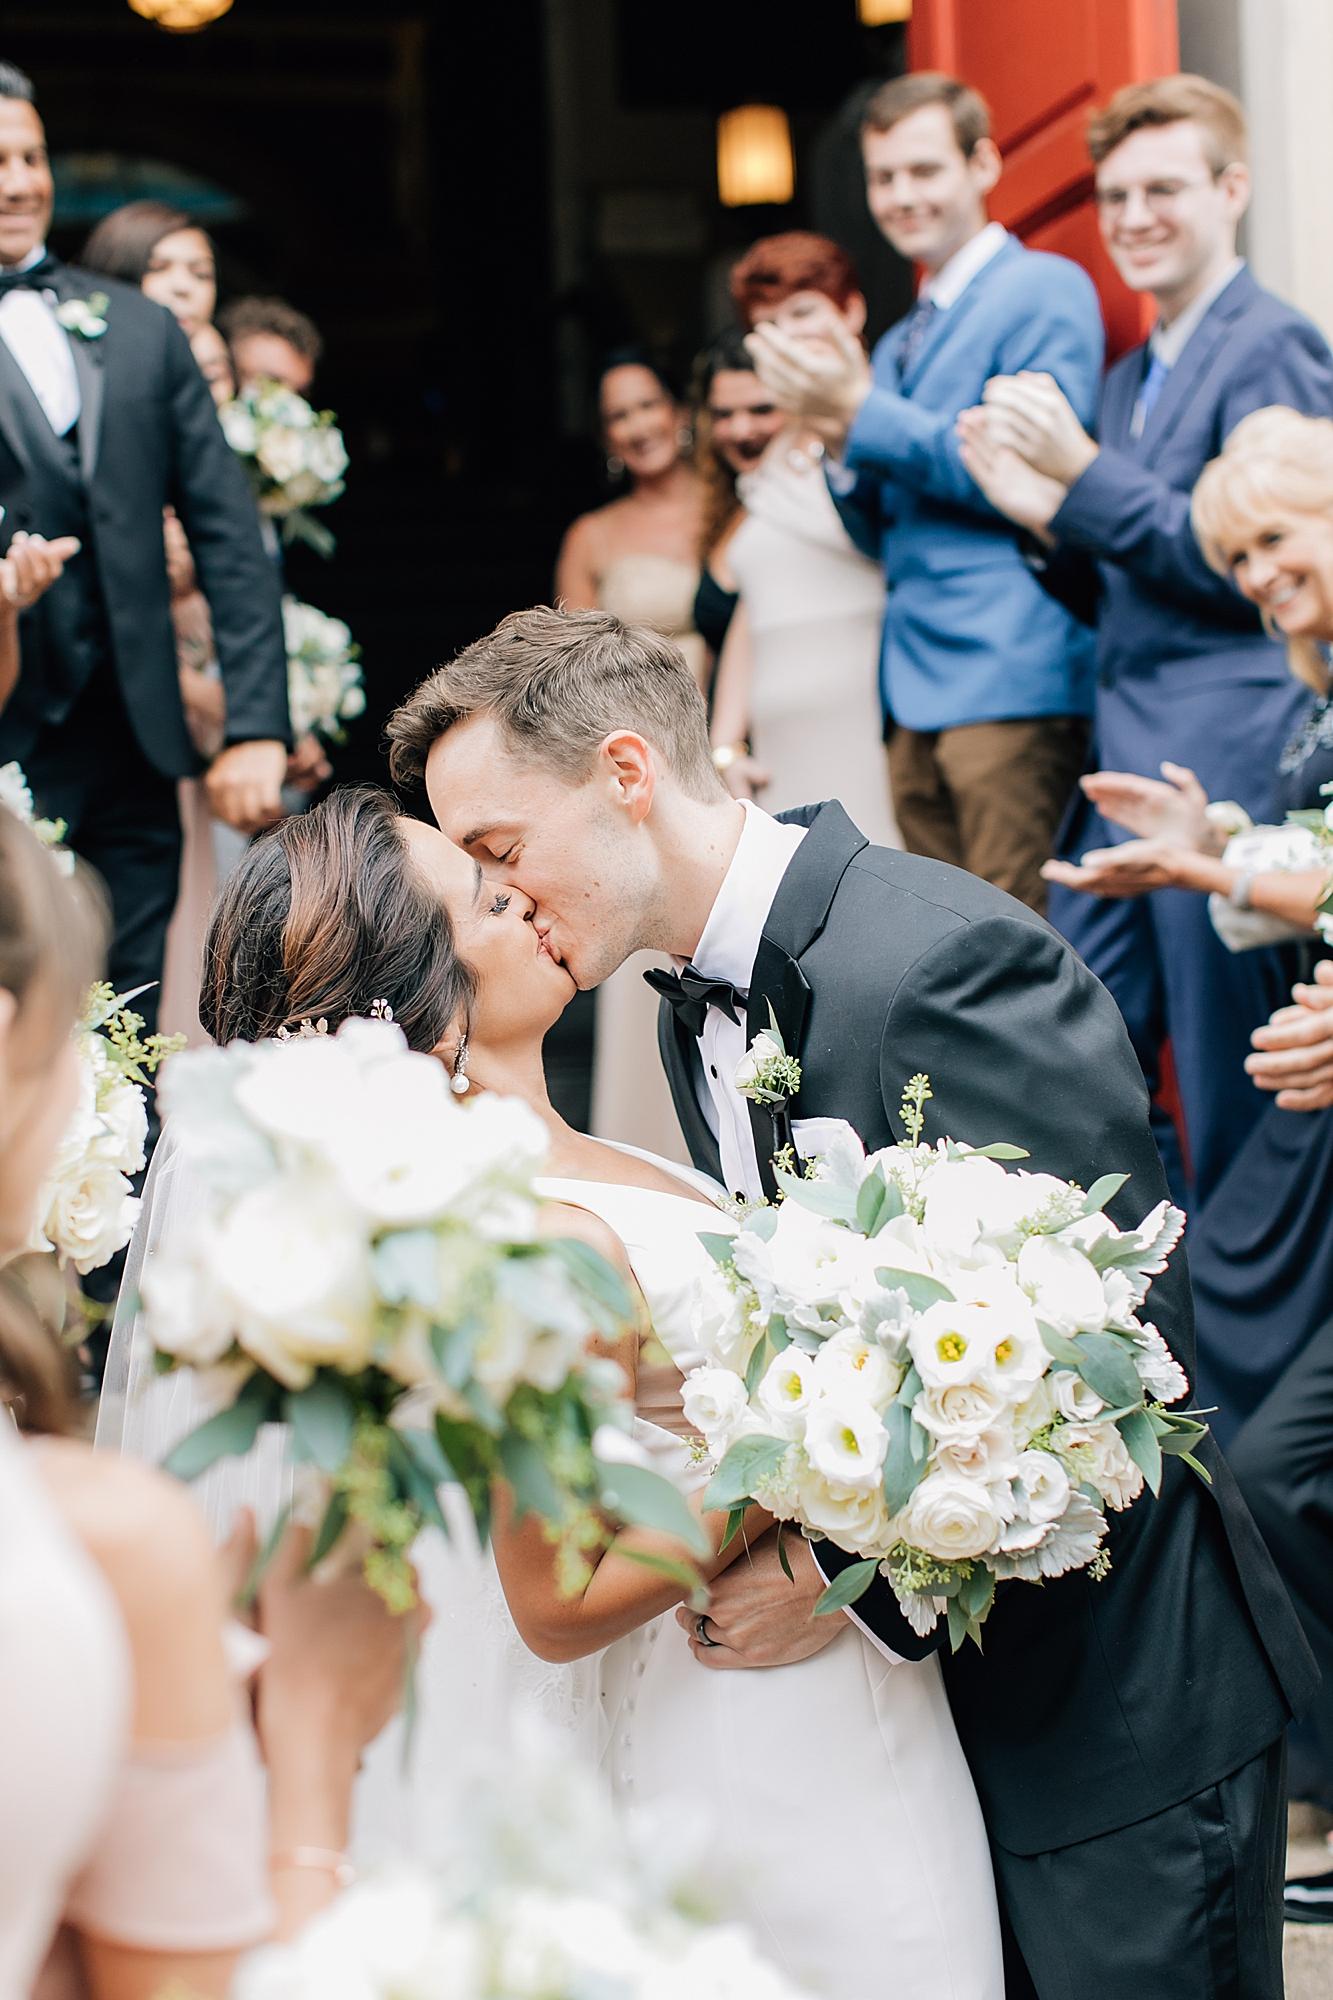 Cescaphe Philadelphia Film Wedding Photography by Magdalena Studios 22